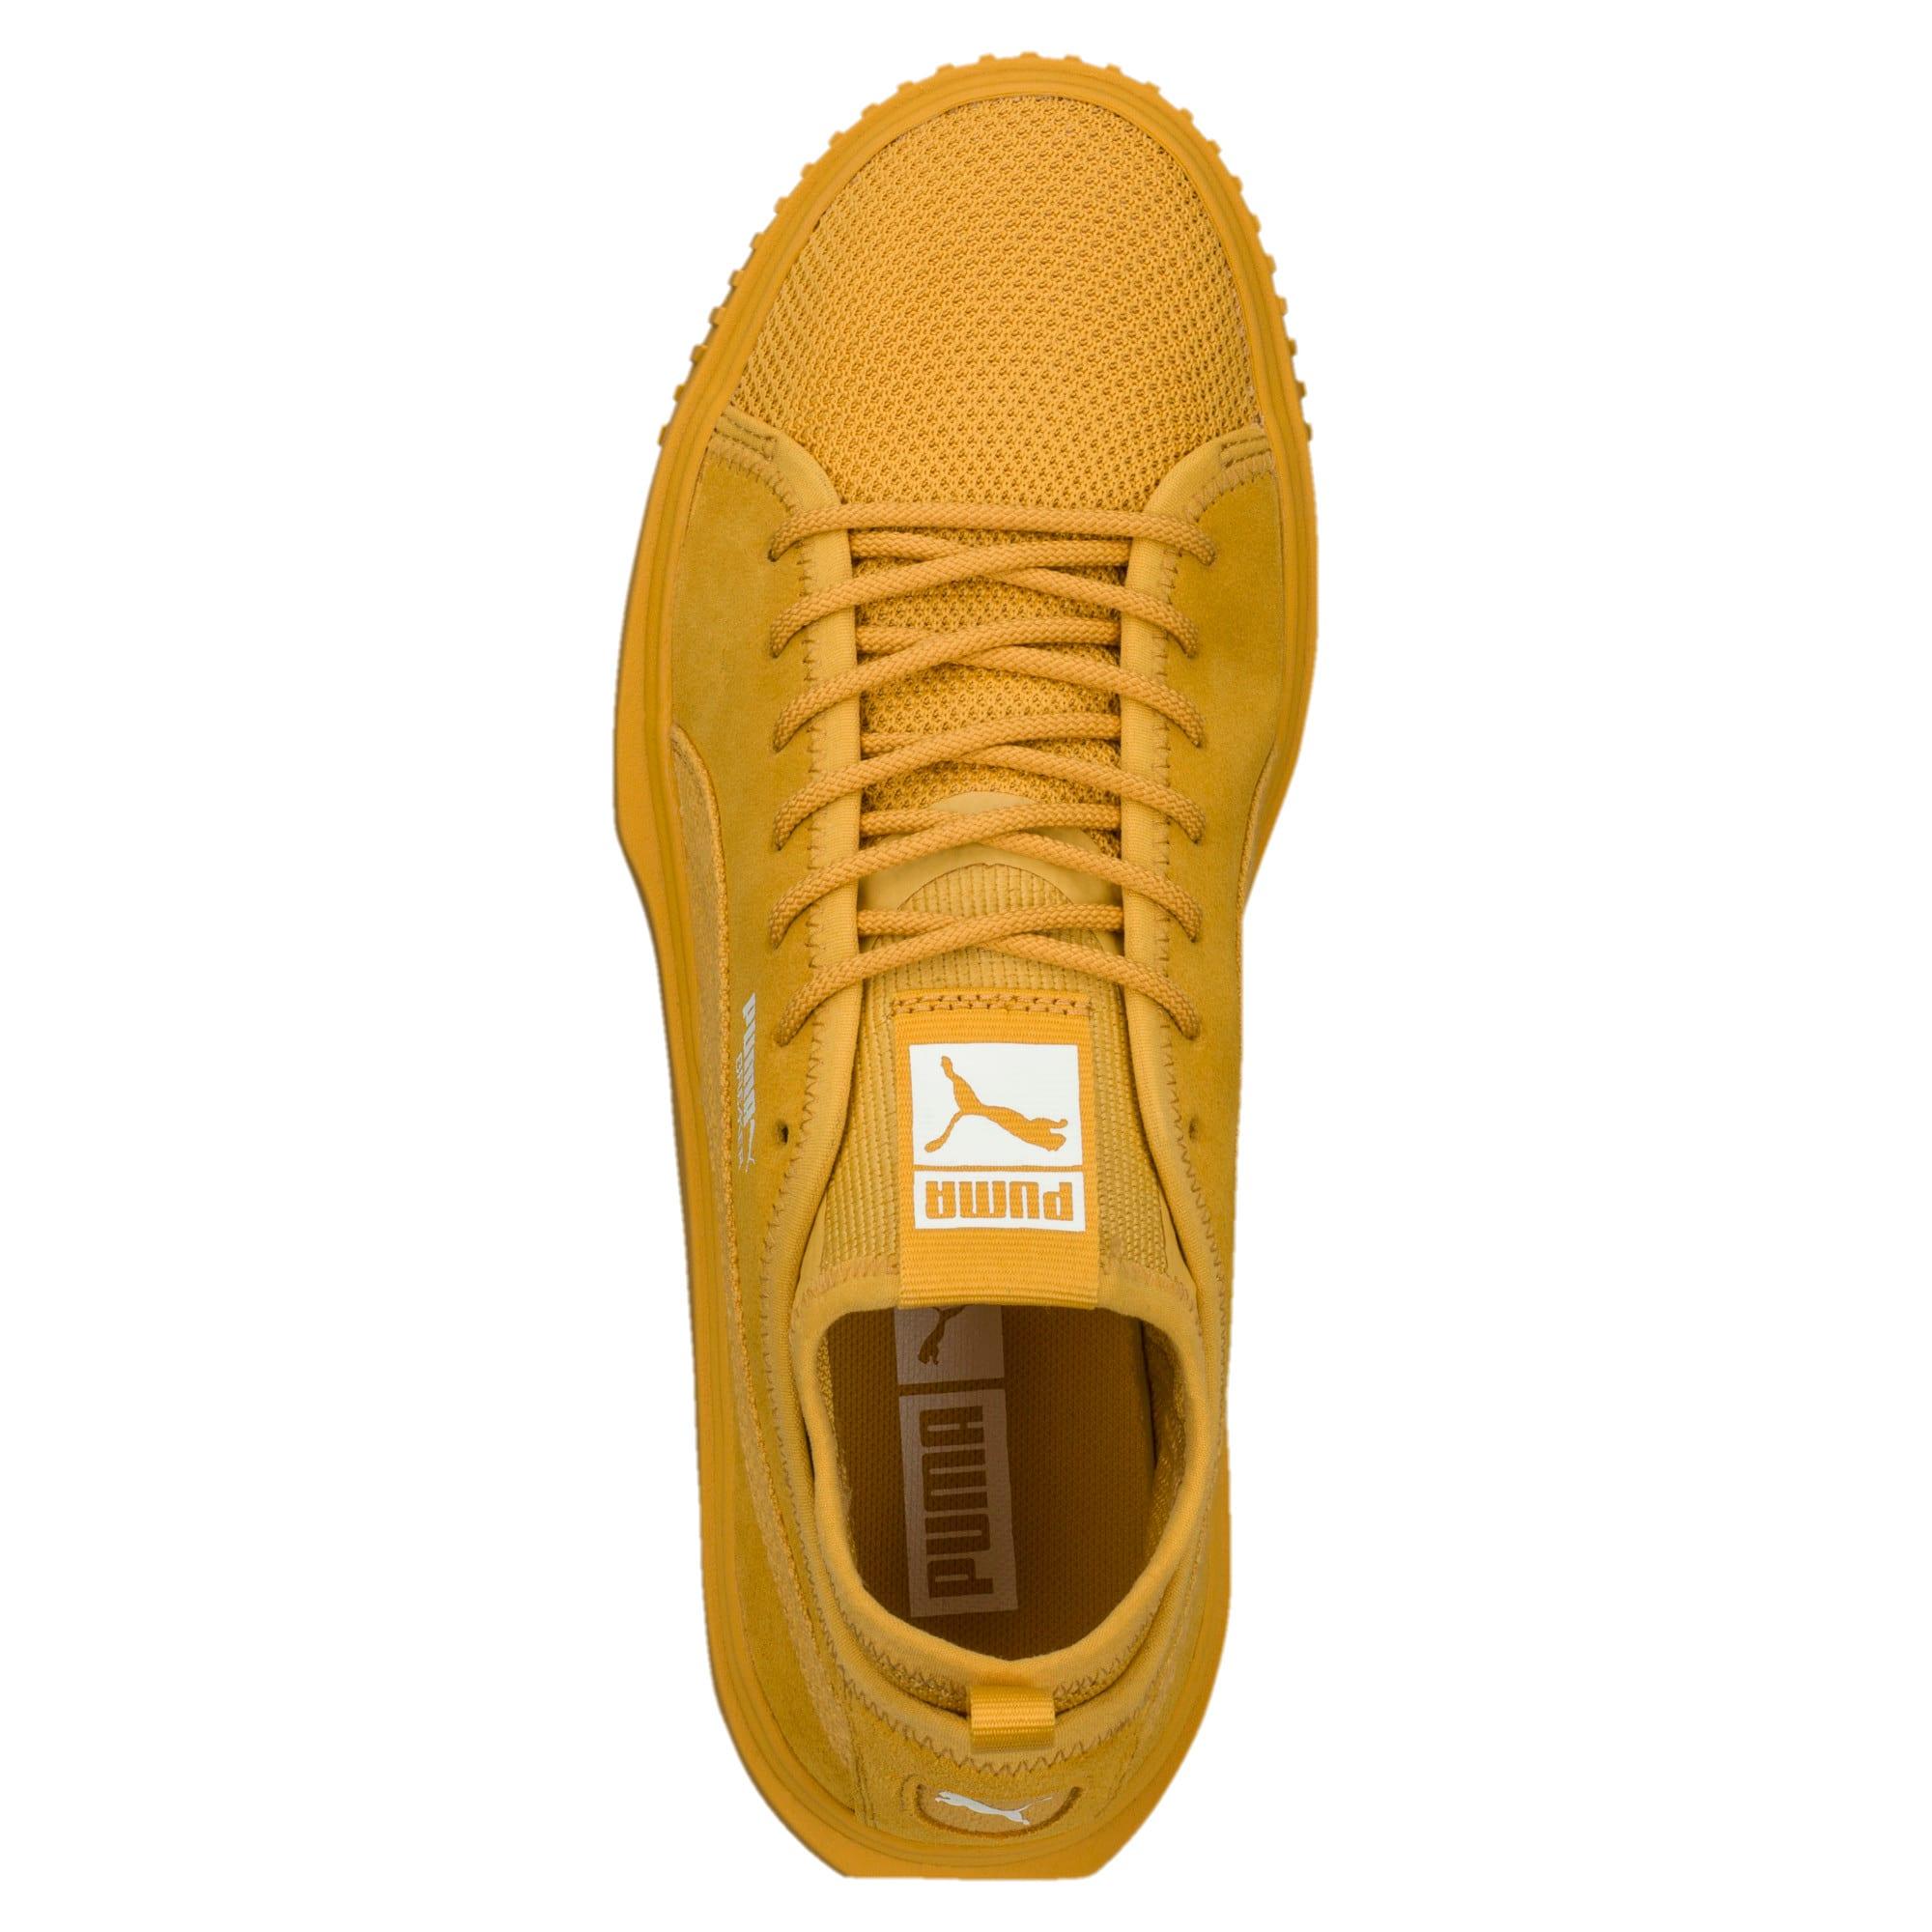 Thumbnail 5 of Breaker Mesh Men's Sneakers, Mineral Yellow-Minl Yellow, medium